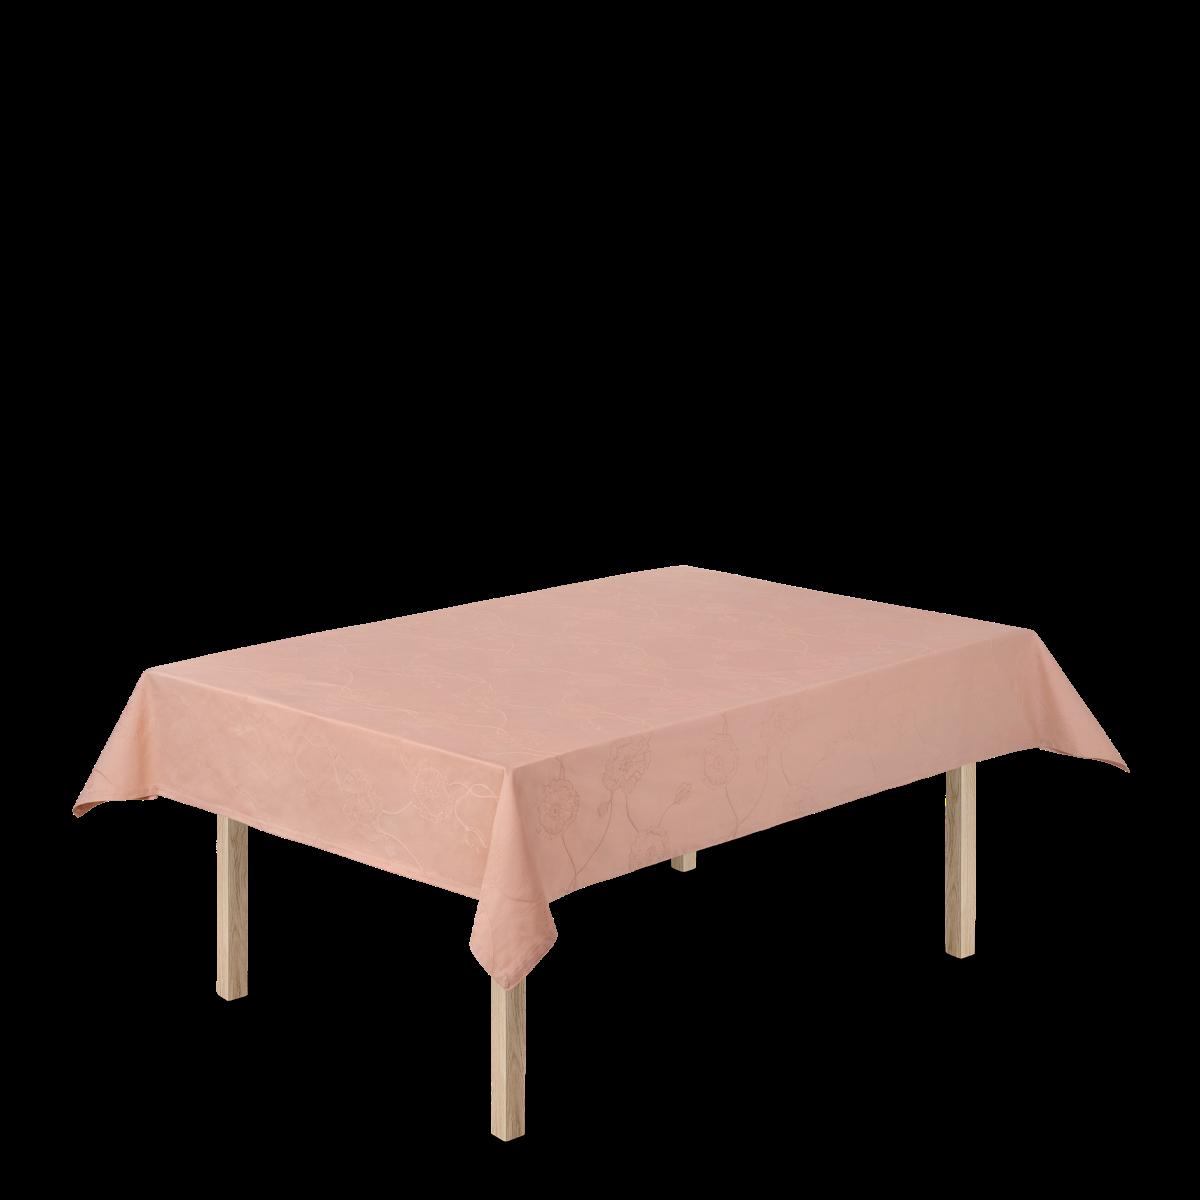 Kähler Hammershøi Poppy damaskdug, nude, 150x220 cm